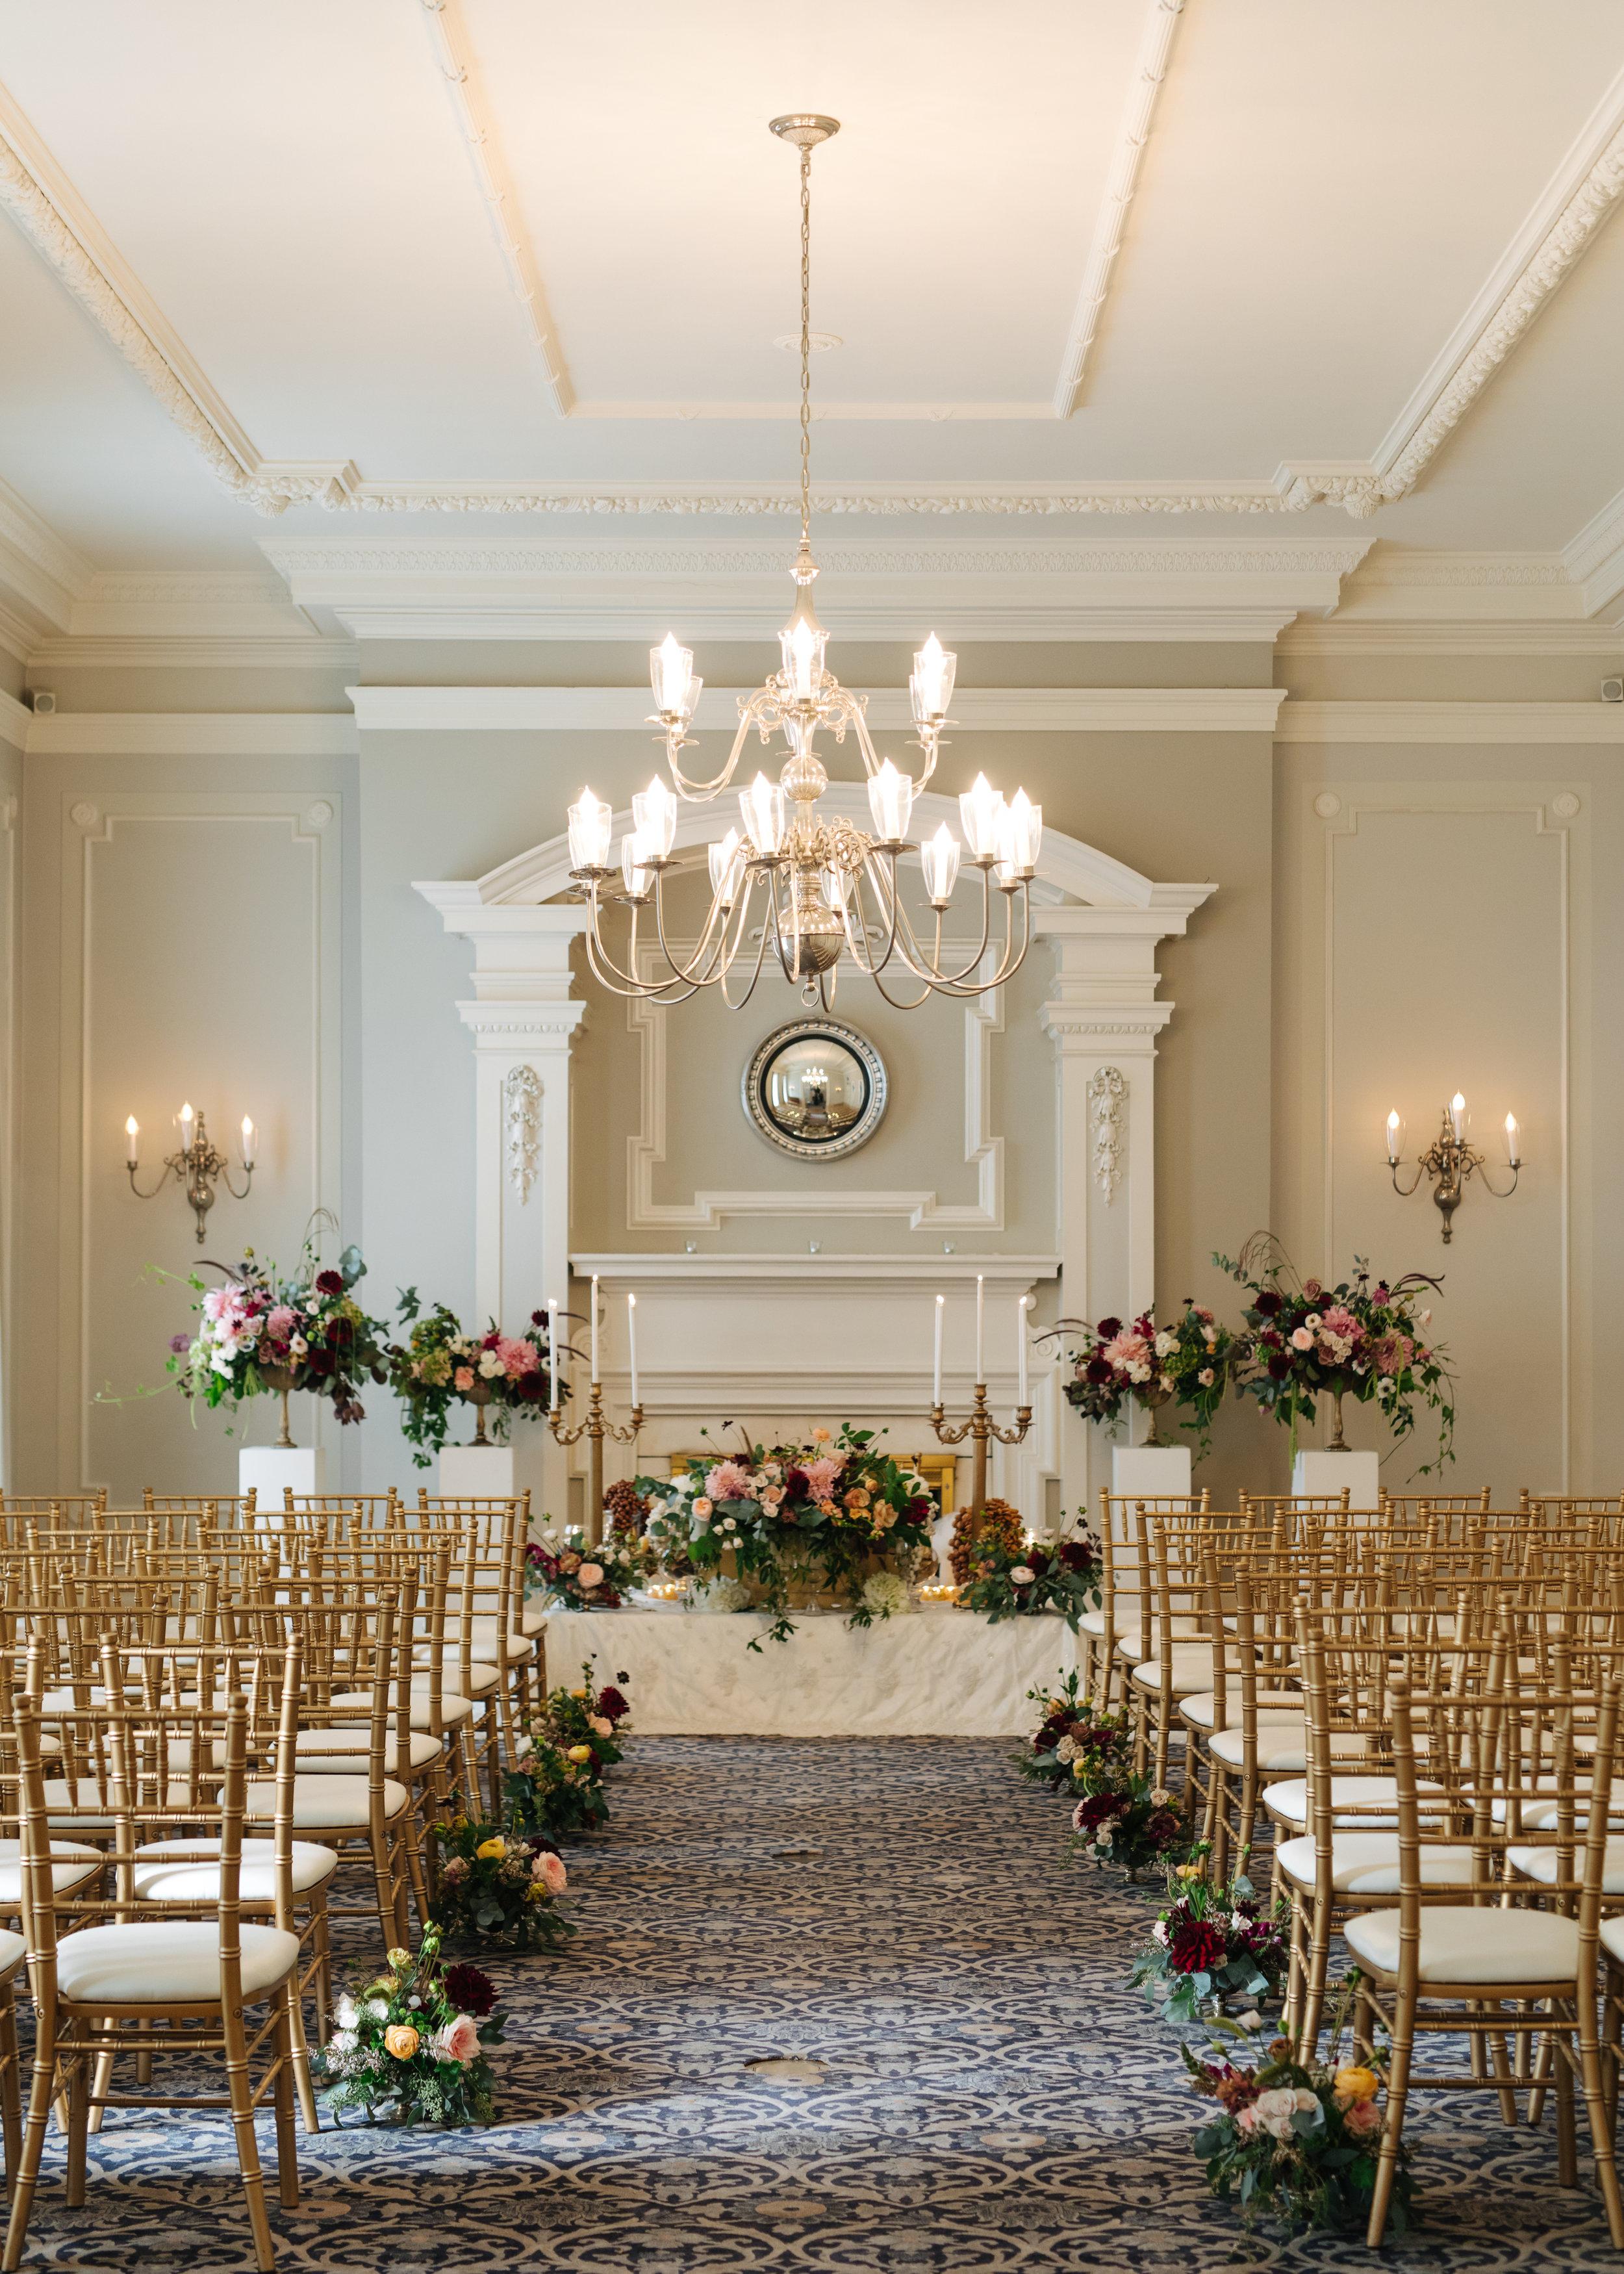 herastudios_wedding_mina_sina_hera_selects-42.jpg